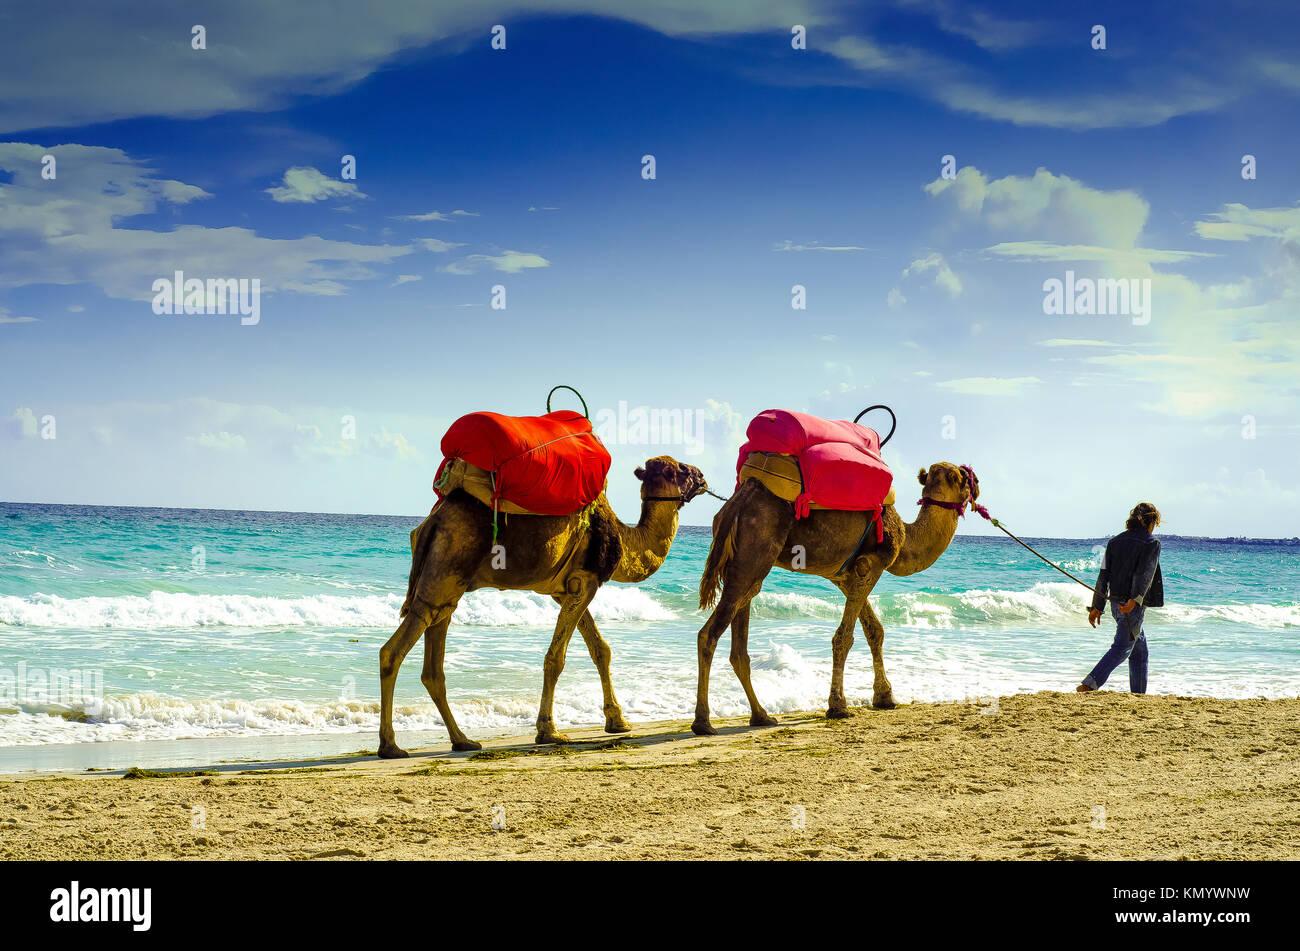 Kamele am Strand, Djerba, 07. November 2014 Stockbild